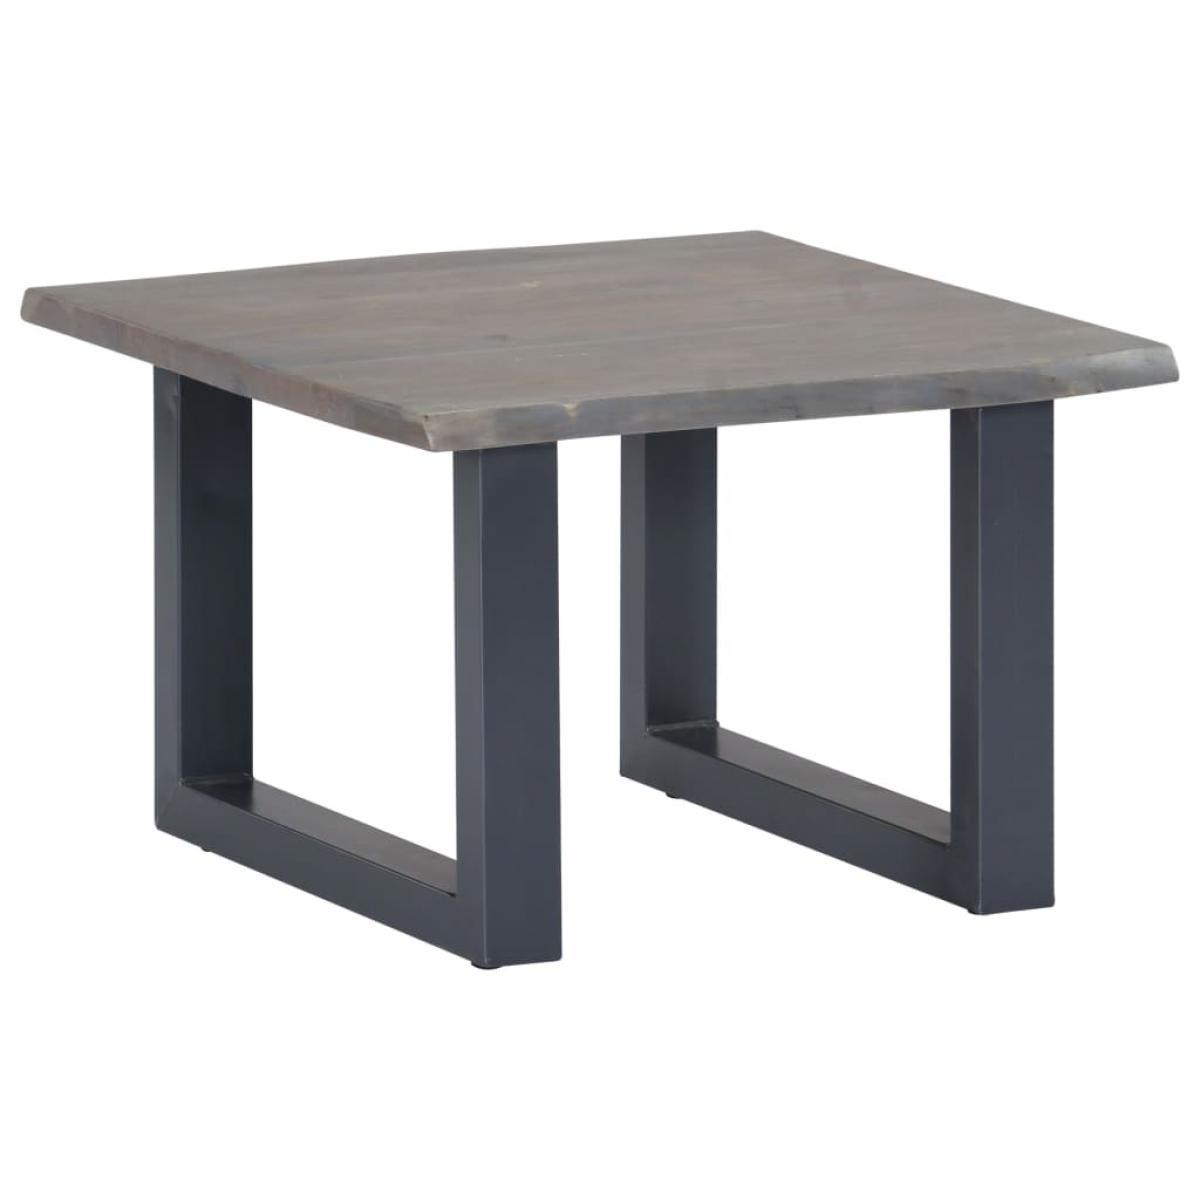 Chunhelife Table basse avec bord naturel Gris 60x60x40 cm Bois d'acacia